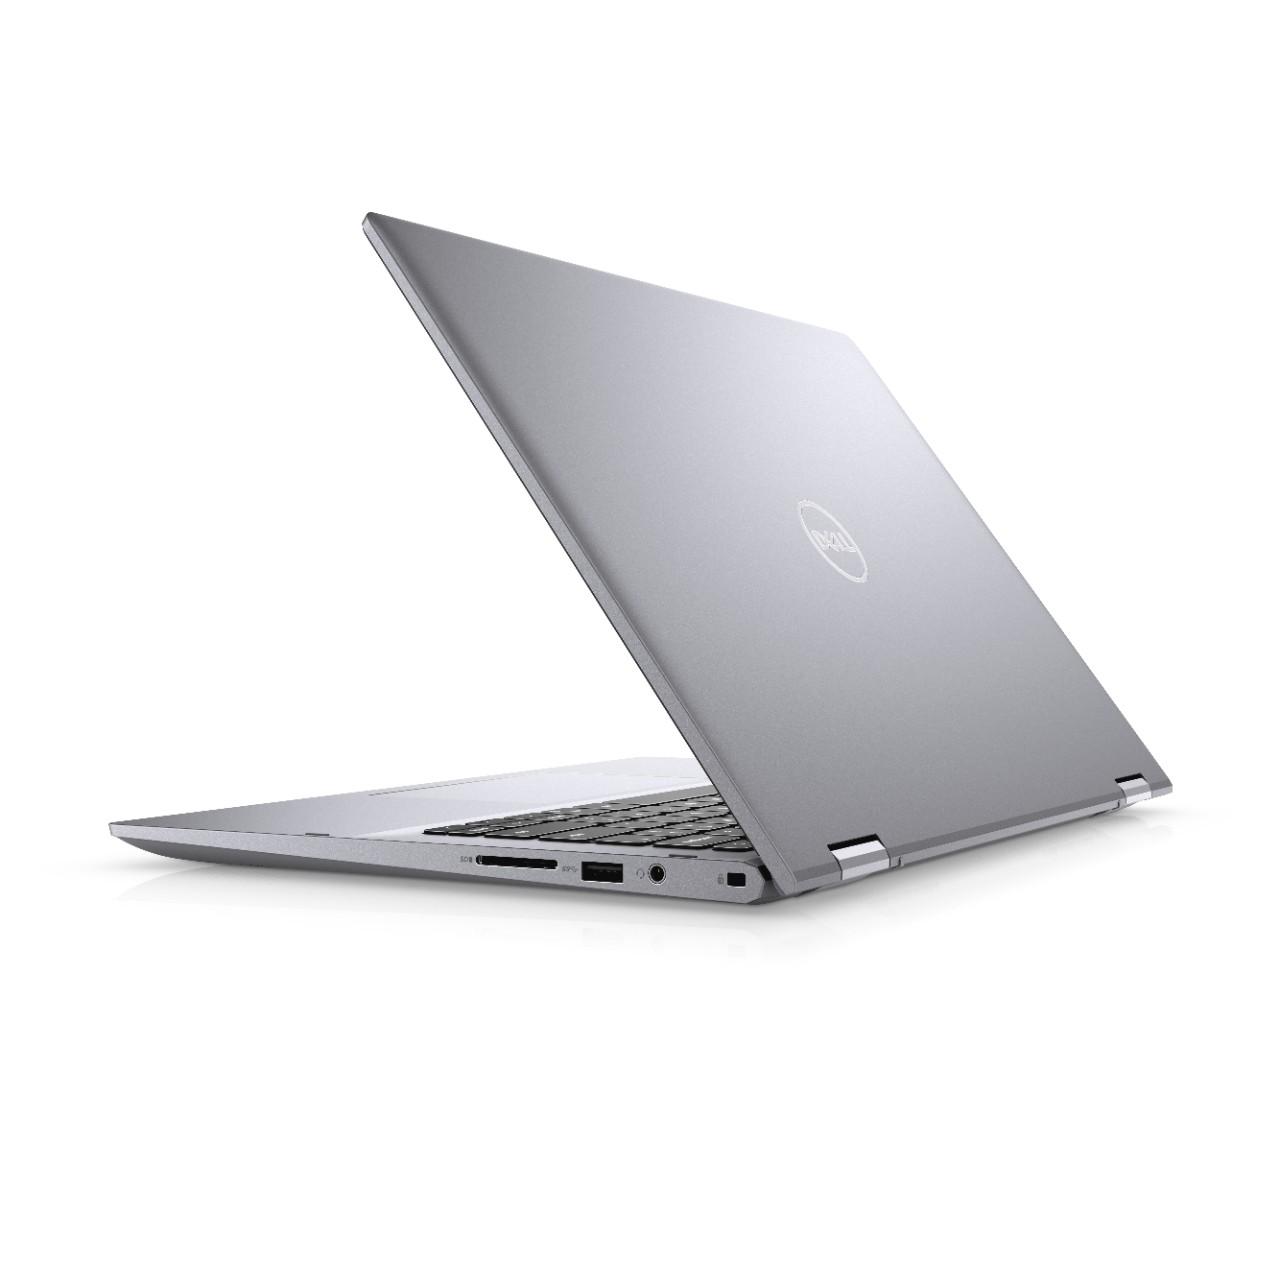 Dell Inspiron 5406 14'' FHD 2v1 Touch i7-1165G7/8GB/512GB/FPR/HDMI/USB-C/W10Home/2RNBD/Stříbrný - TN-5406-N2-711S